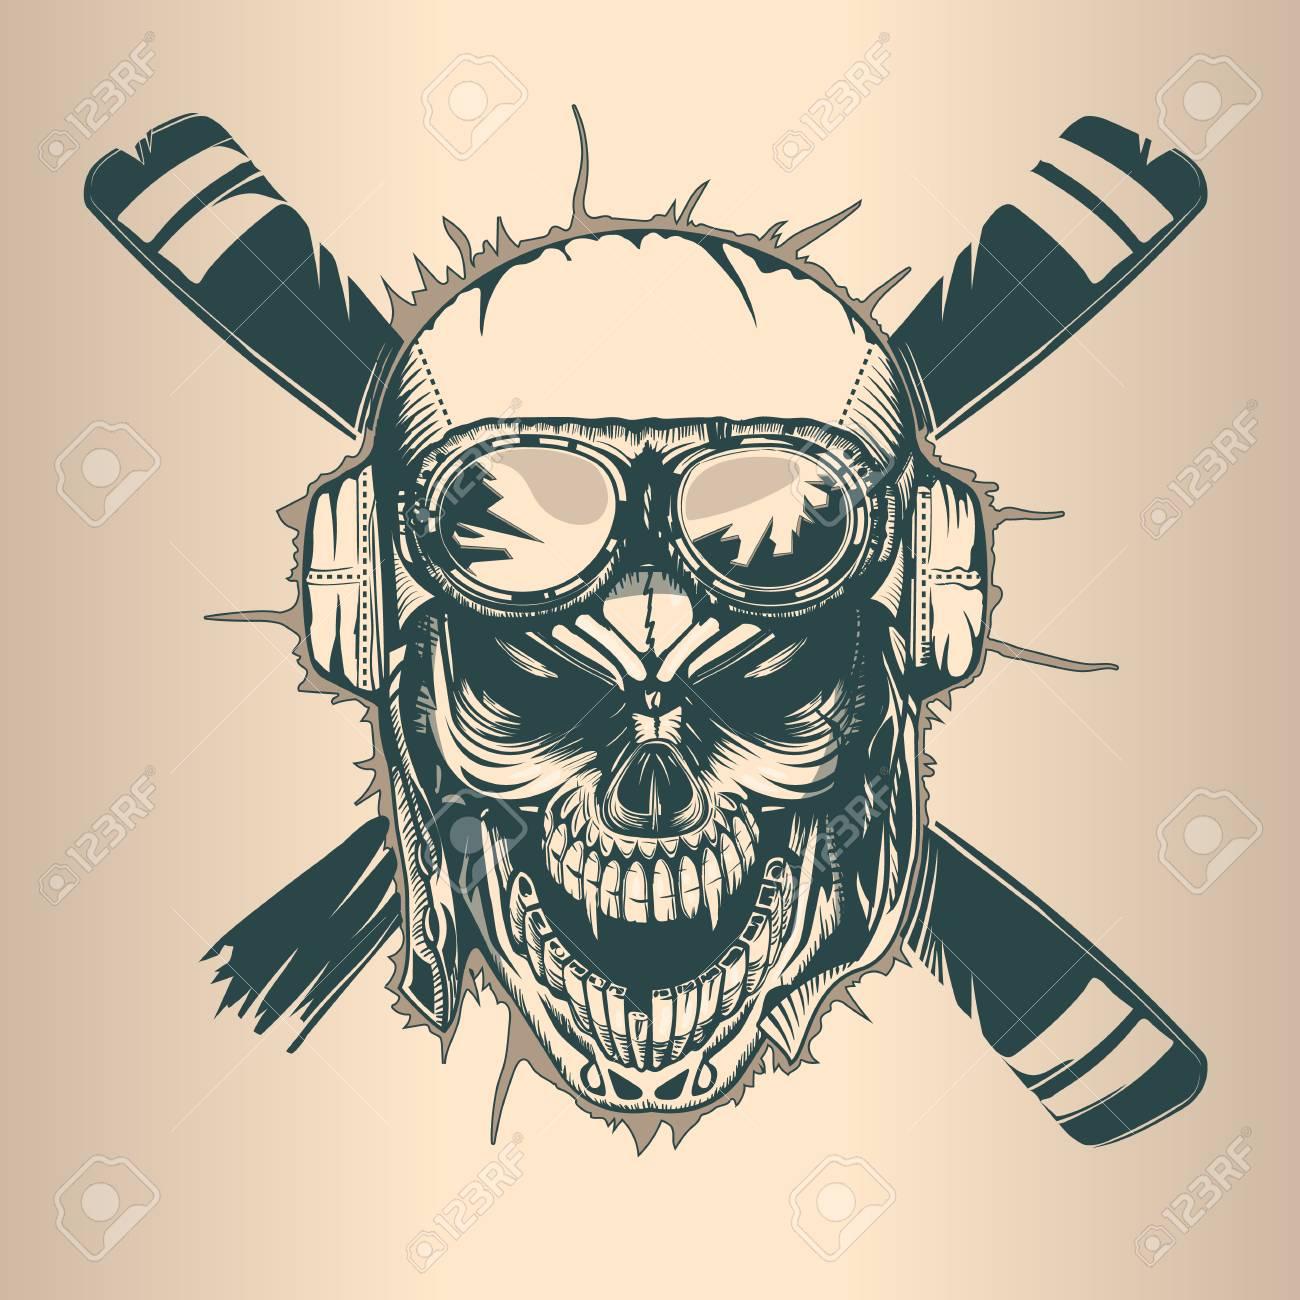 Vintage pilot skull, monochrome hand drawn tatoo style - 104576143